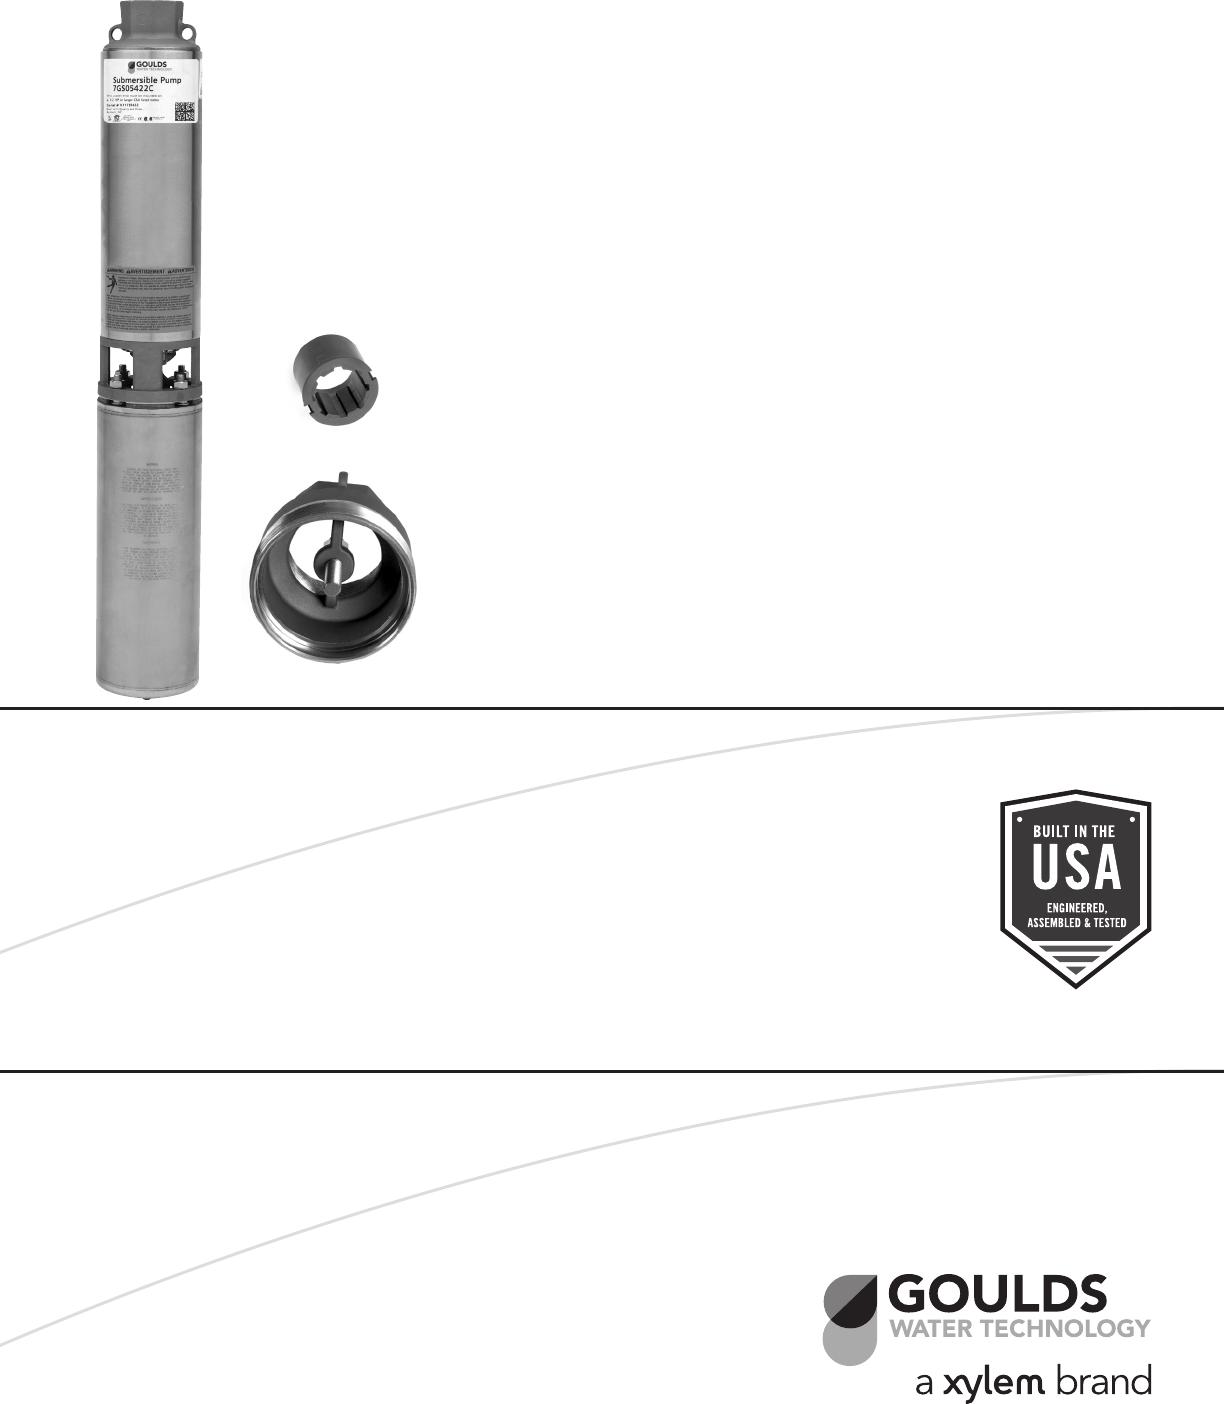 548749 3 Goulds GS CBM Extreme 4 Inch Submersible Pump End